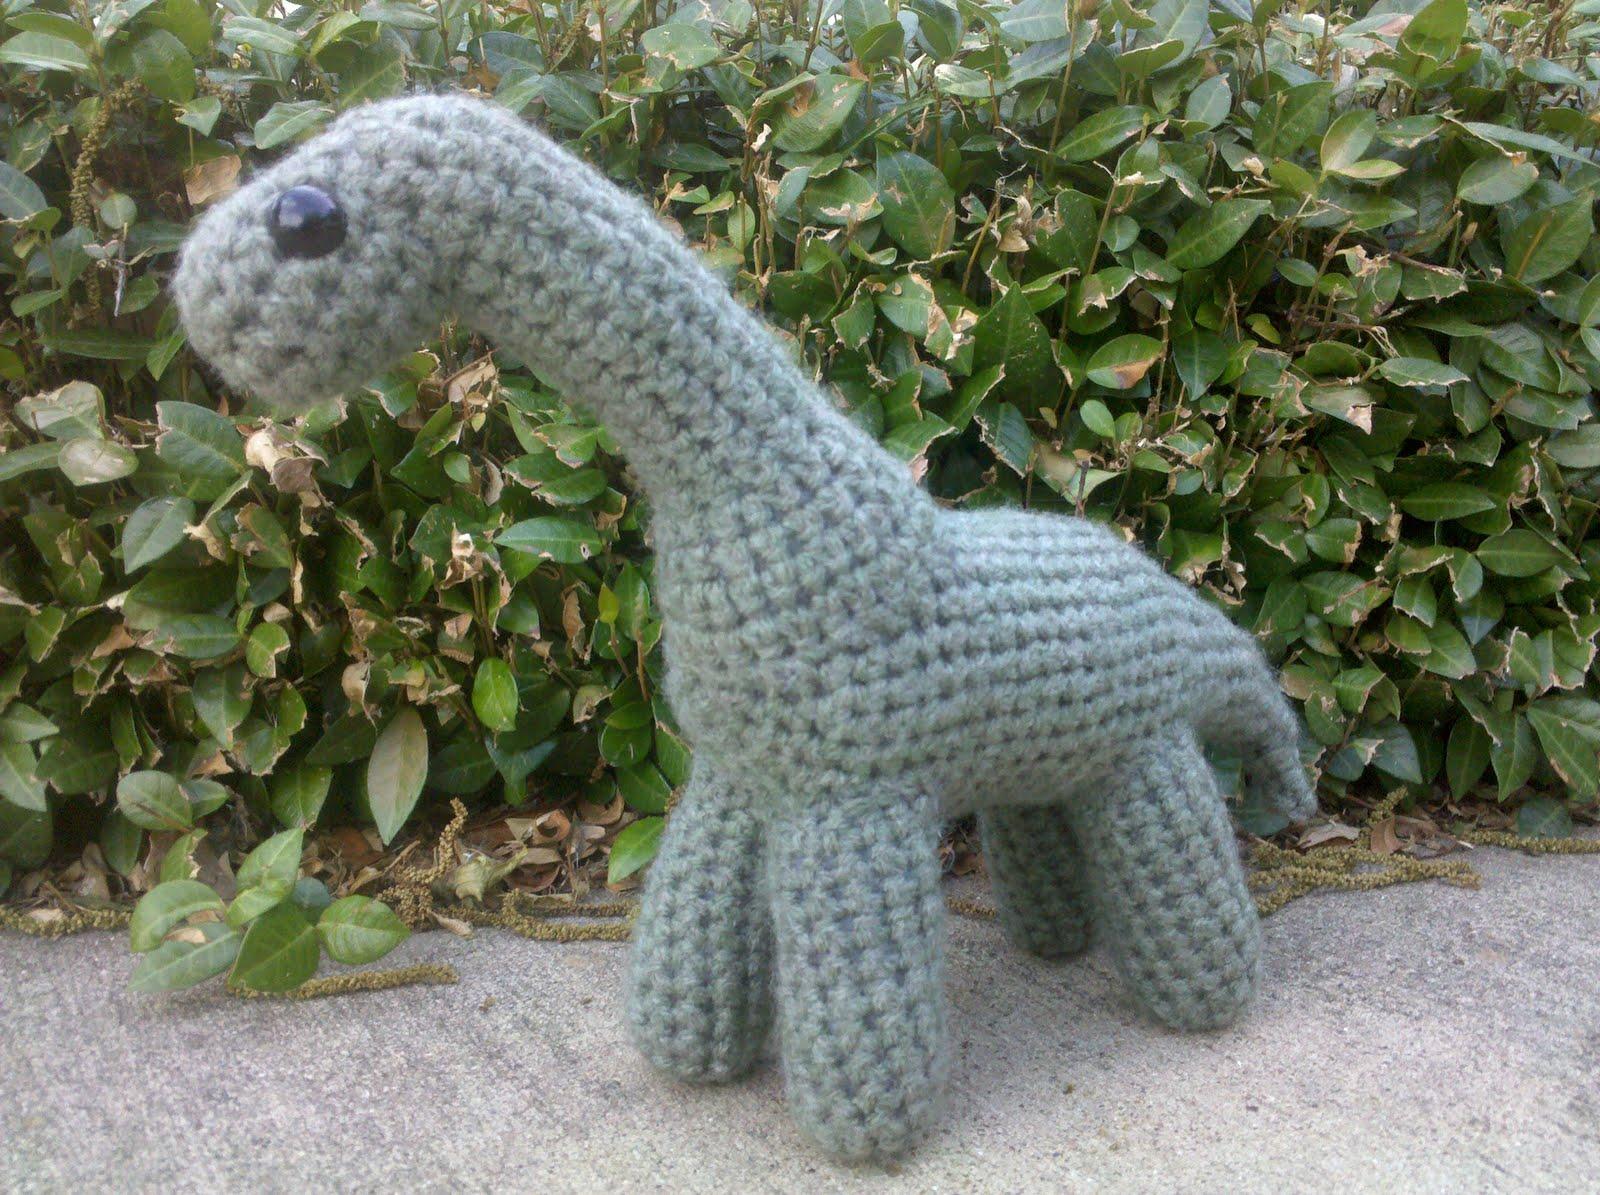 Amigurumi Dinosaur Pattern Free : Knottys Amigurumi: Longneck Dinosaur